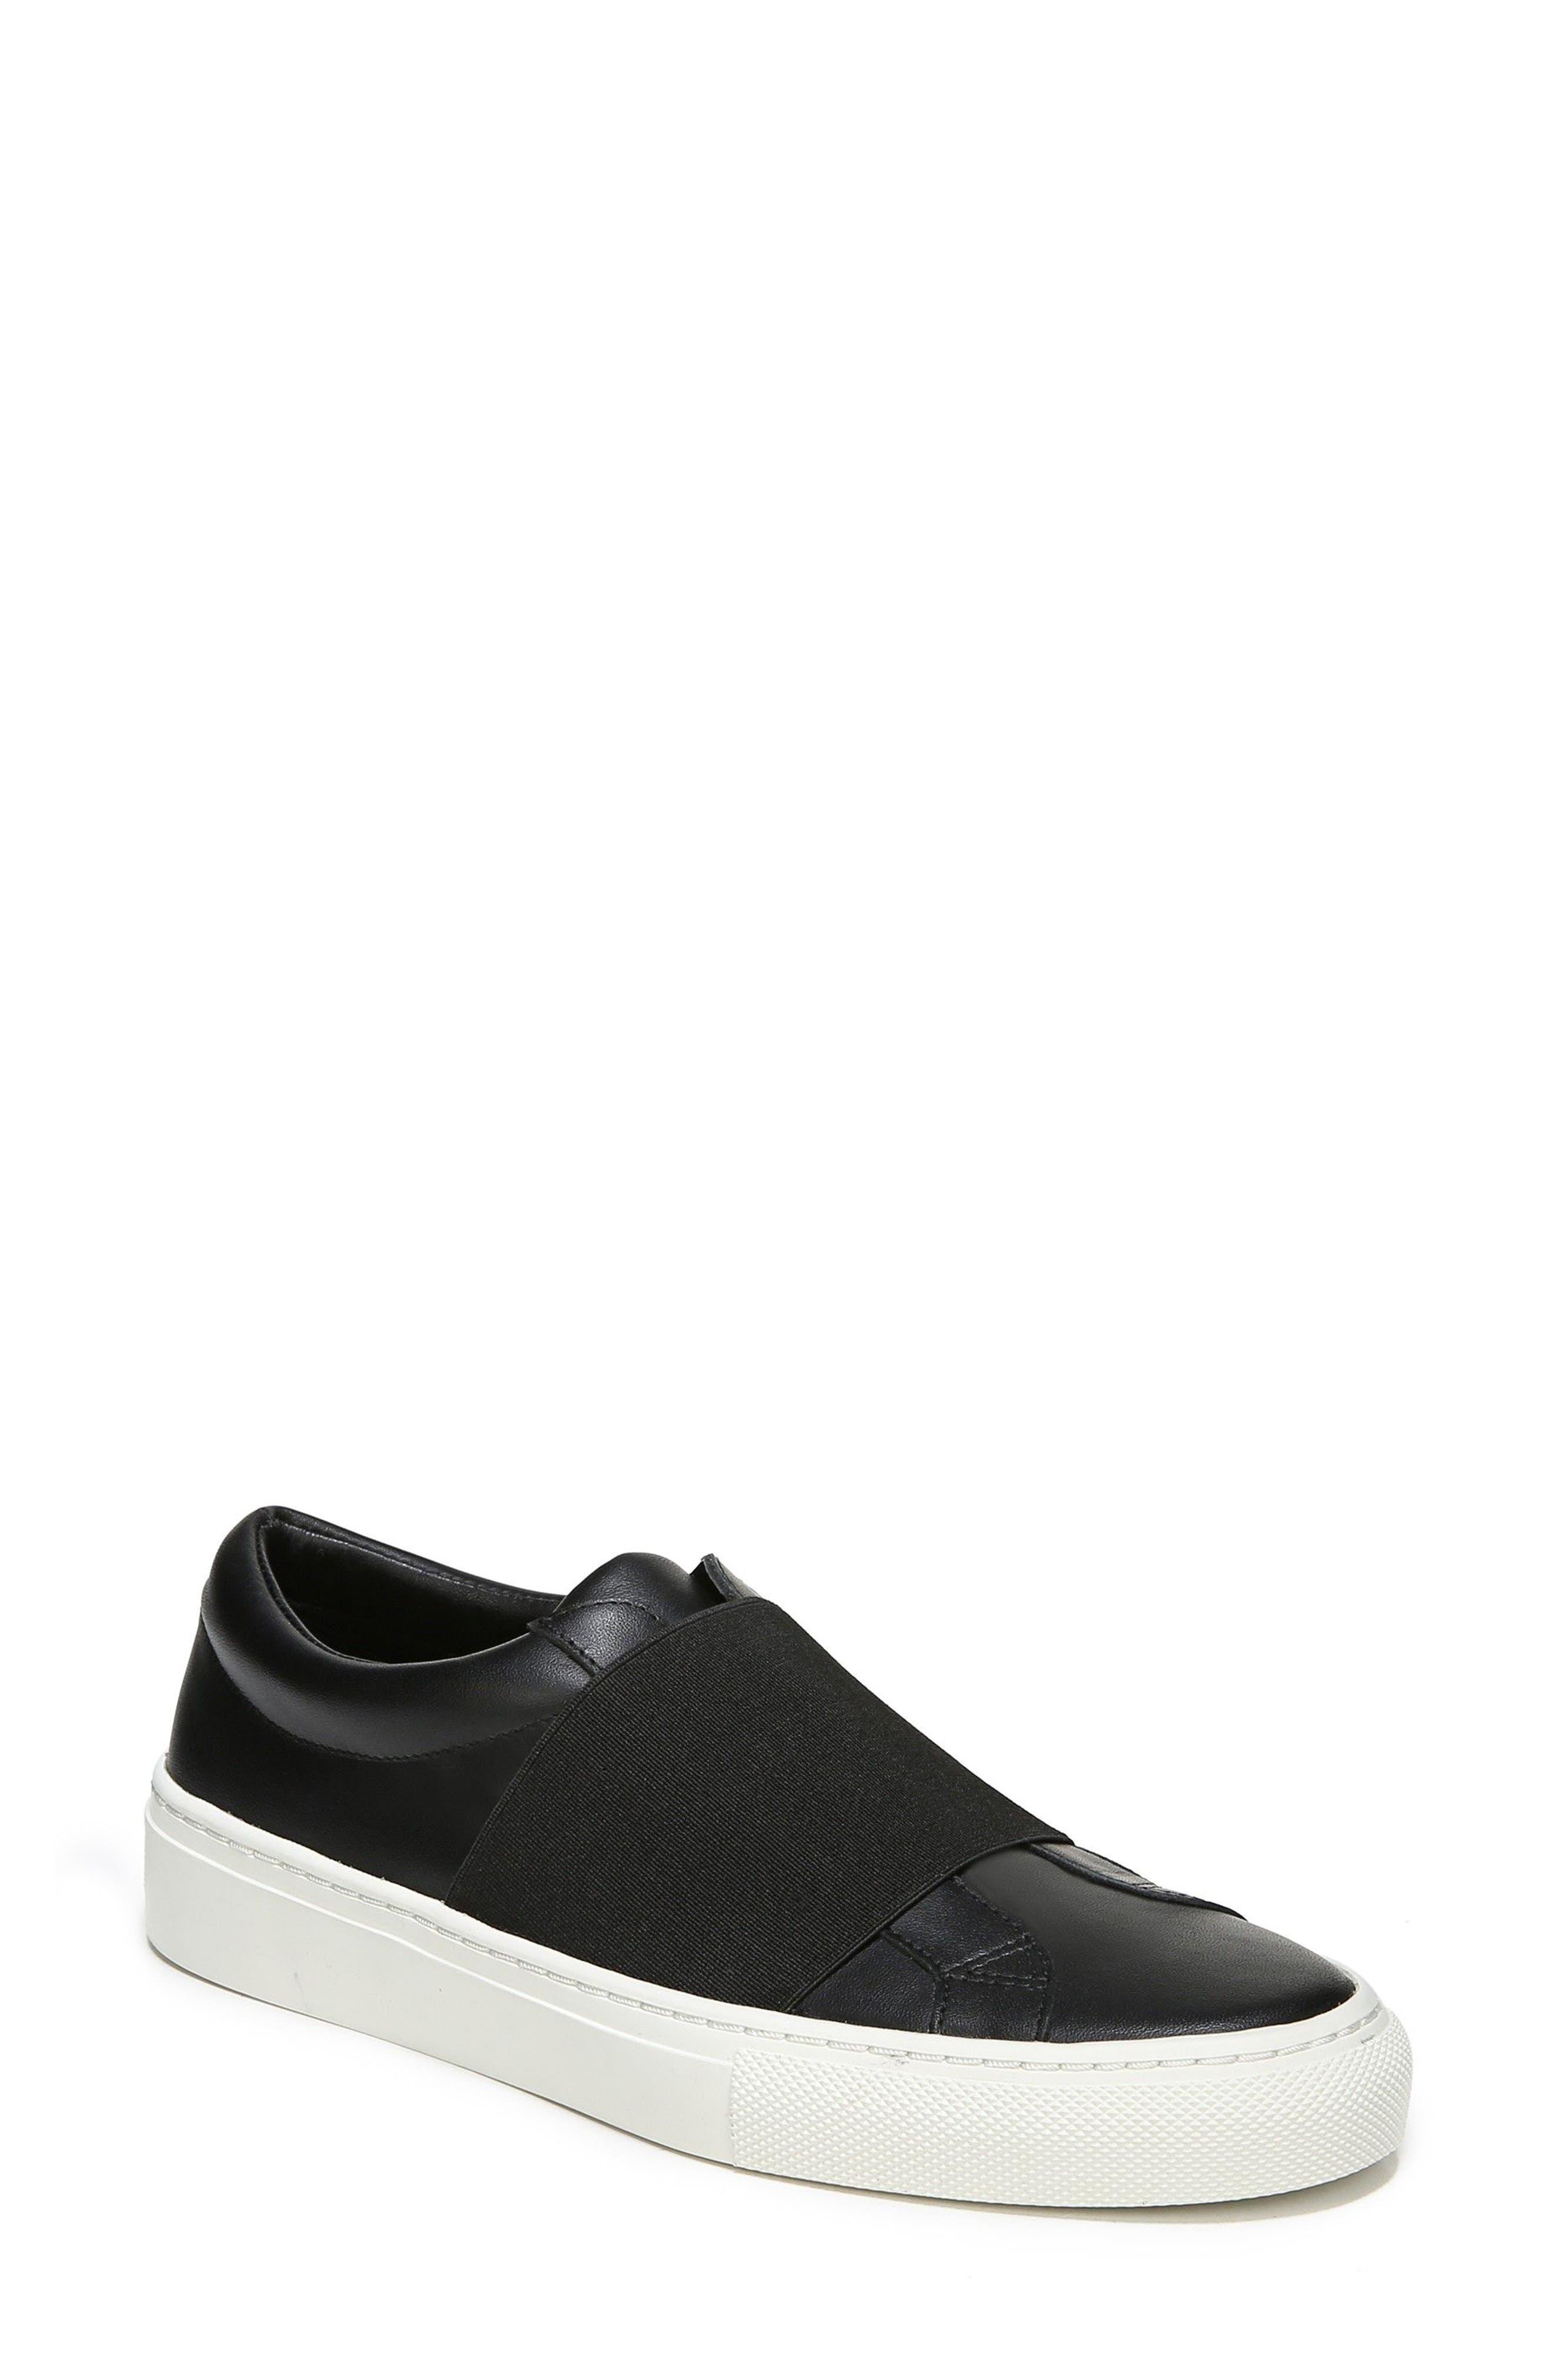 Saran Slip-On Sneaker,                         Main,                         color, 003